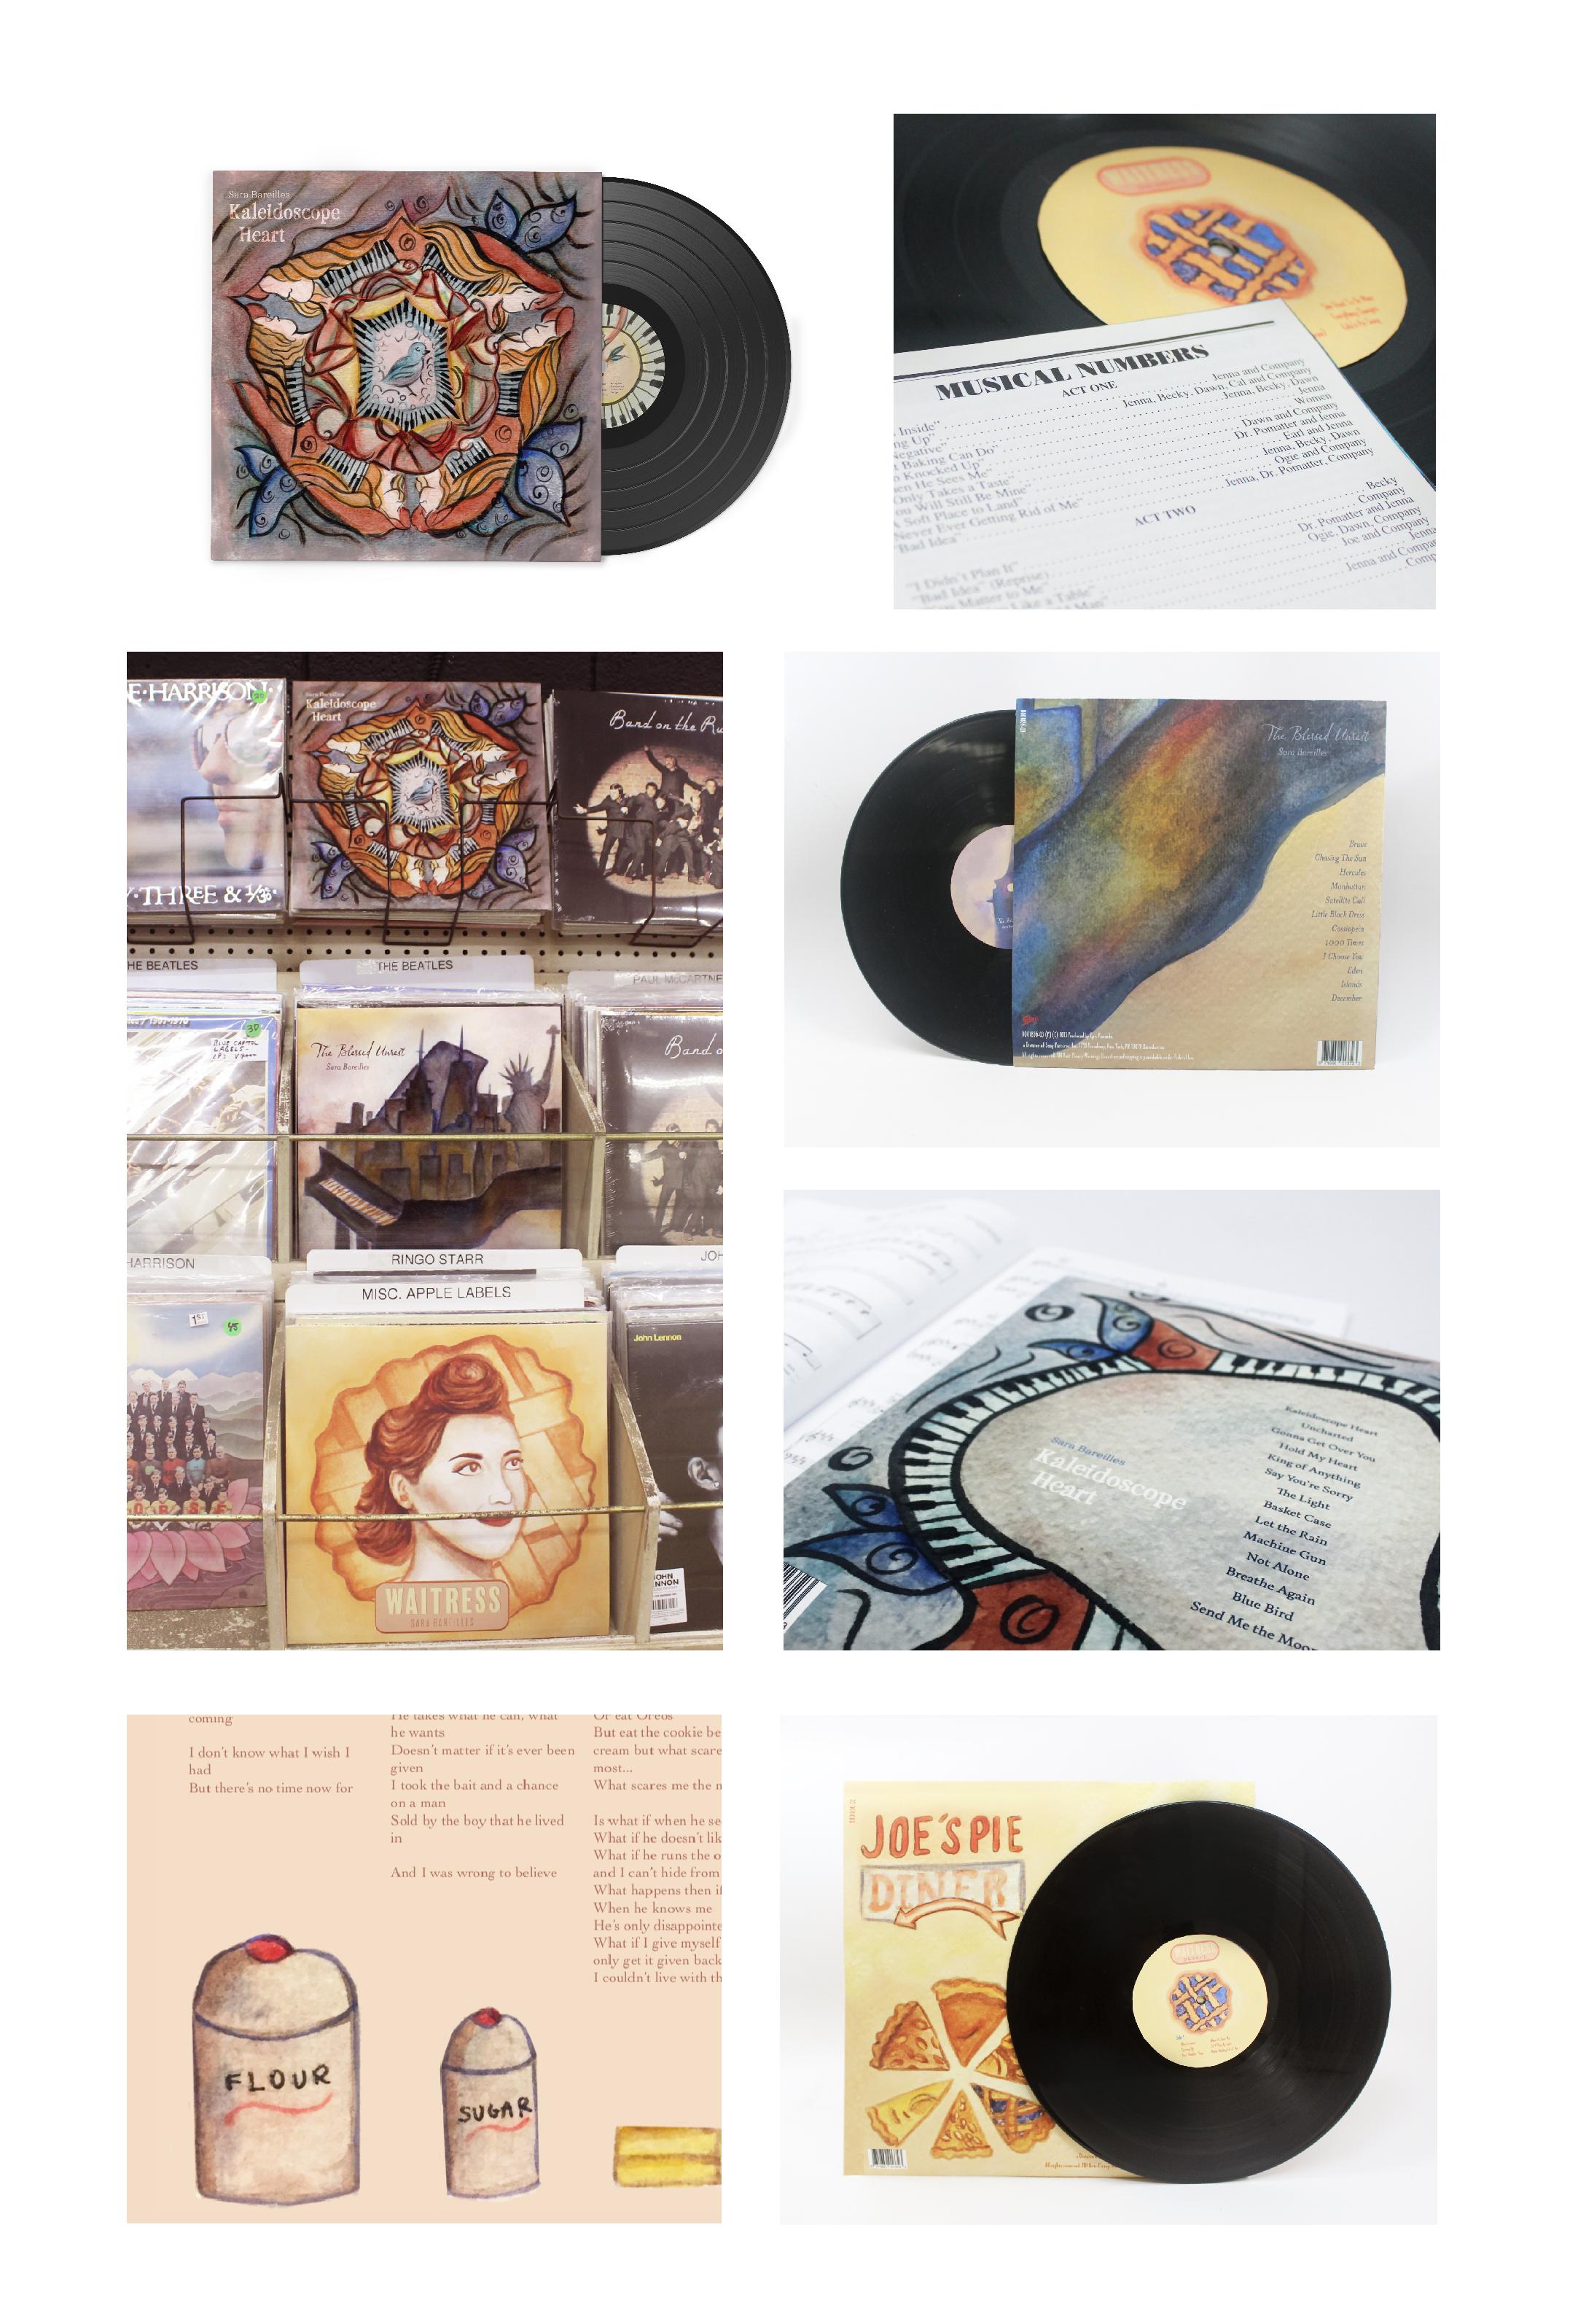 album gallery@2x-100.jpg